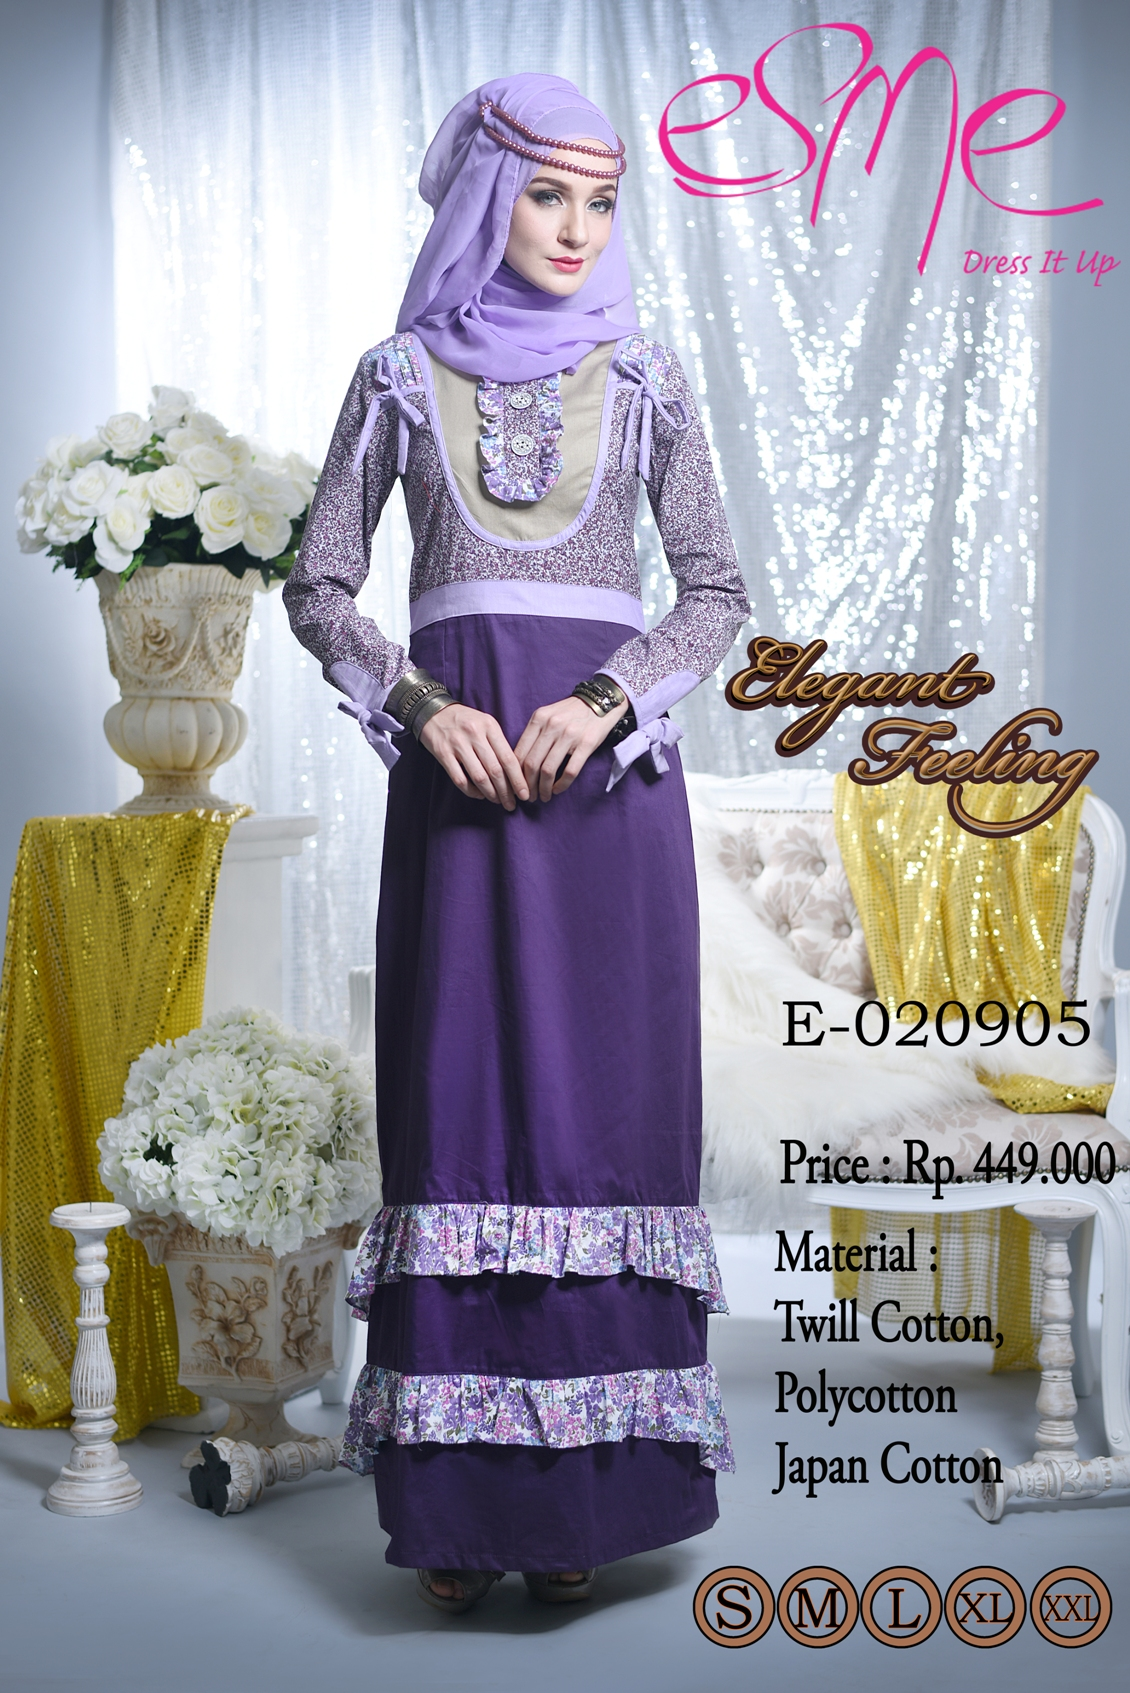 Elegant feeling e 020905 baju muslim gamis modern Baju gamis terbaru xxl